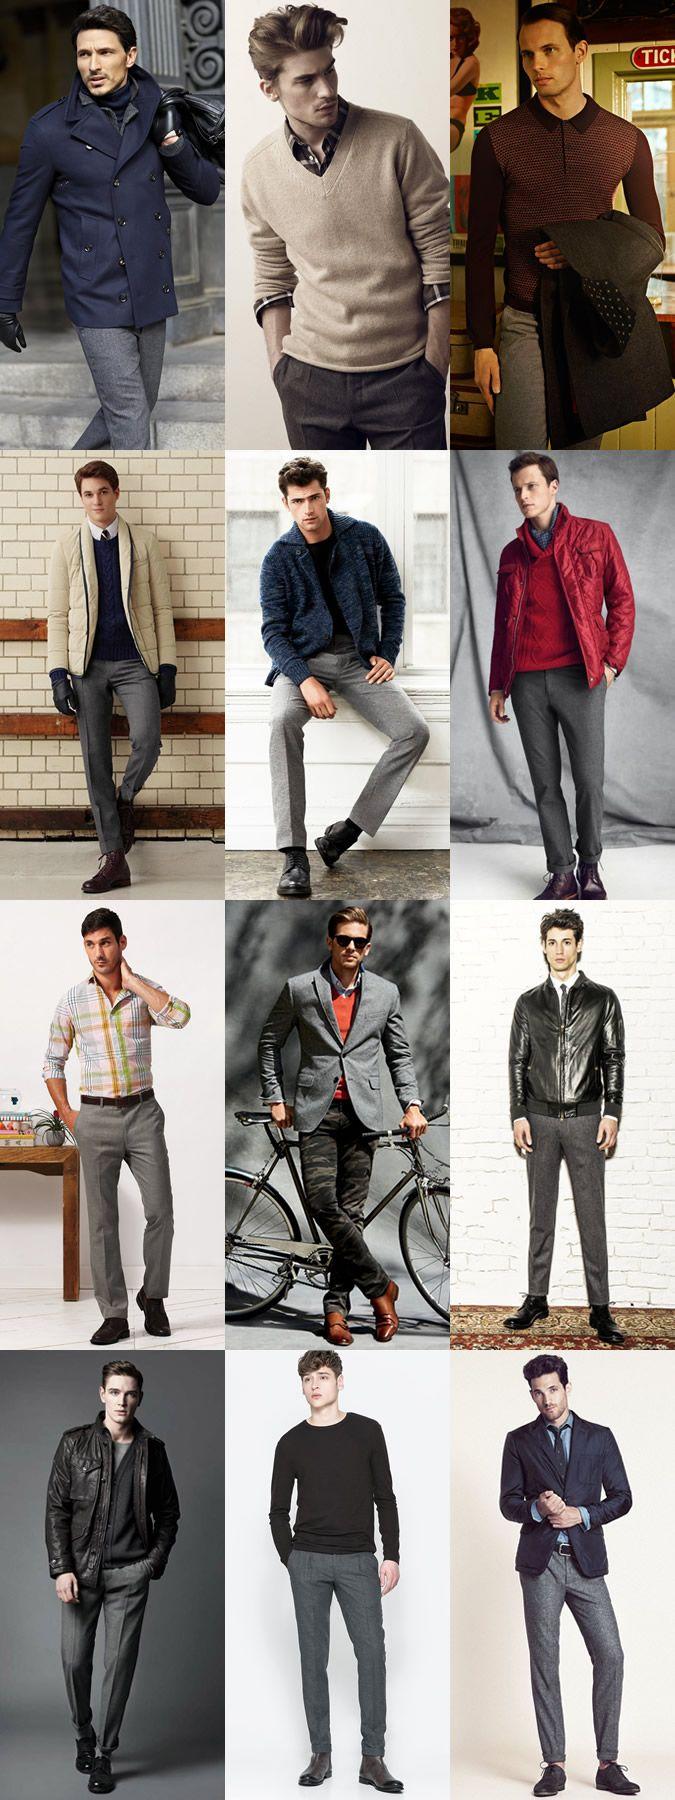 Men's Grey Suit Lookbook - Worn As Separates